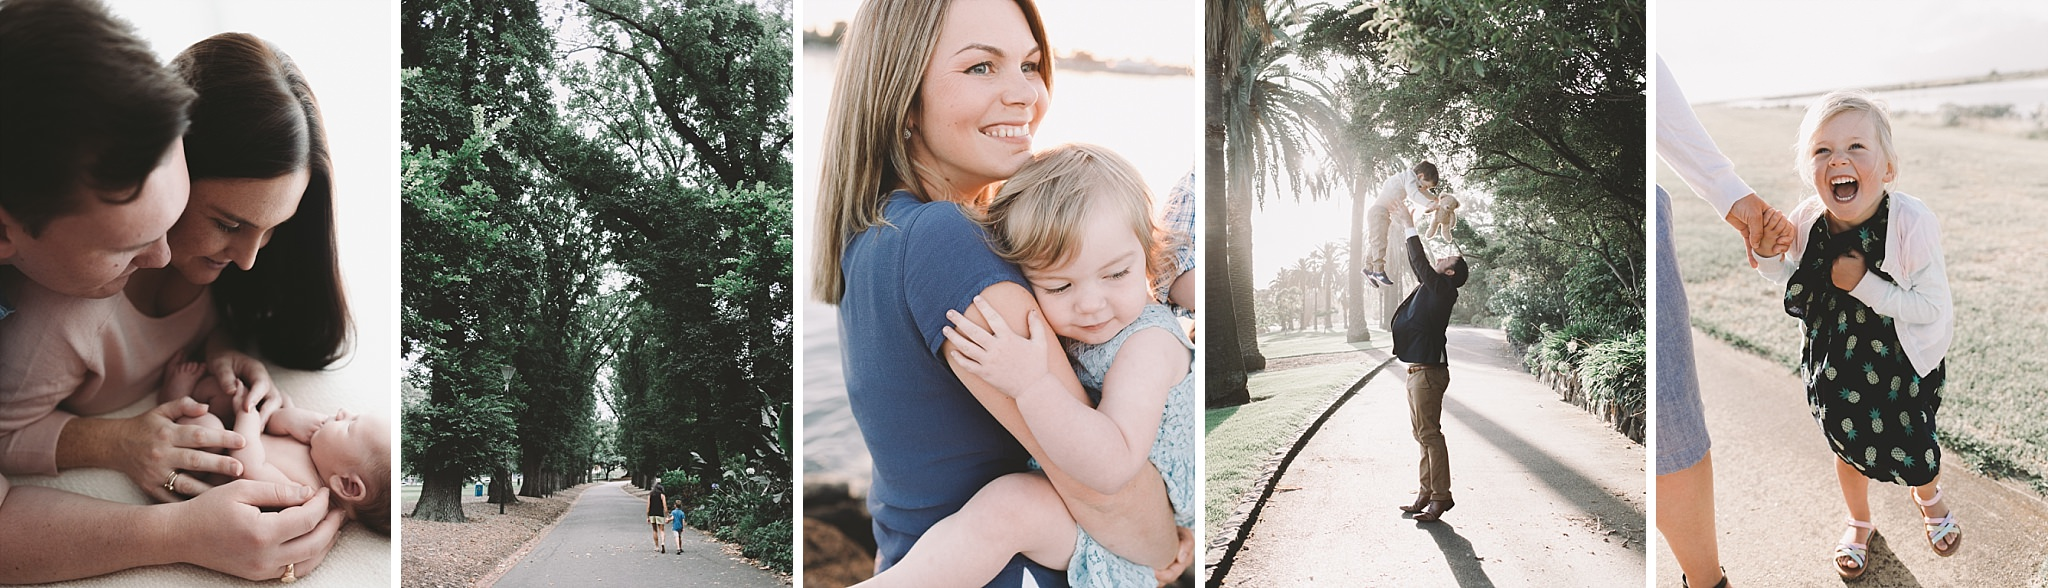 Lecinda Ward, Melbourne Family Newborn and Wedding Photographer_0096.jpg